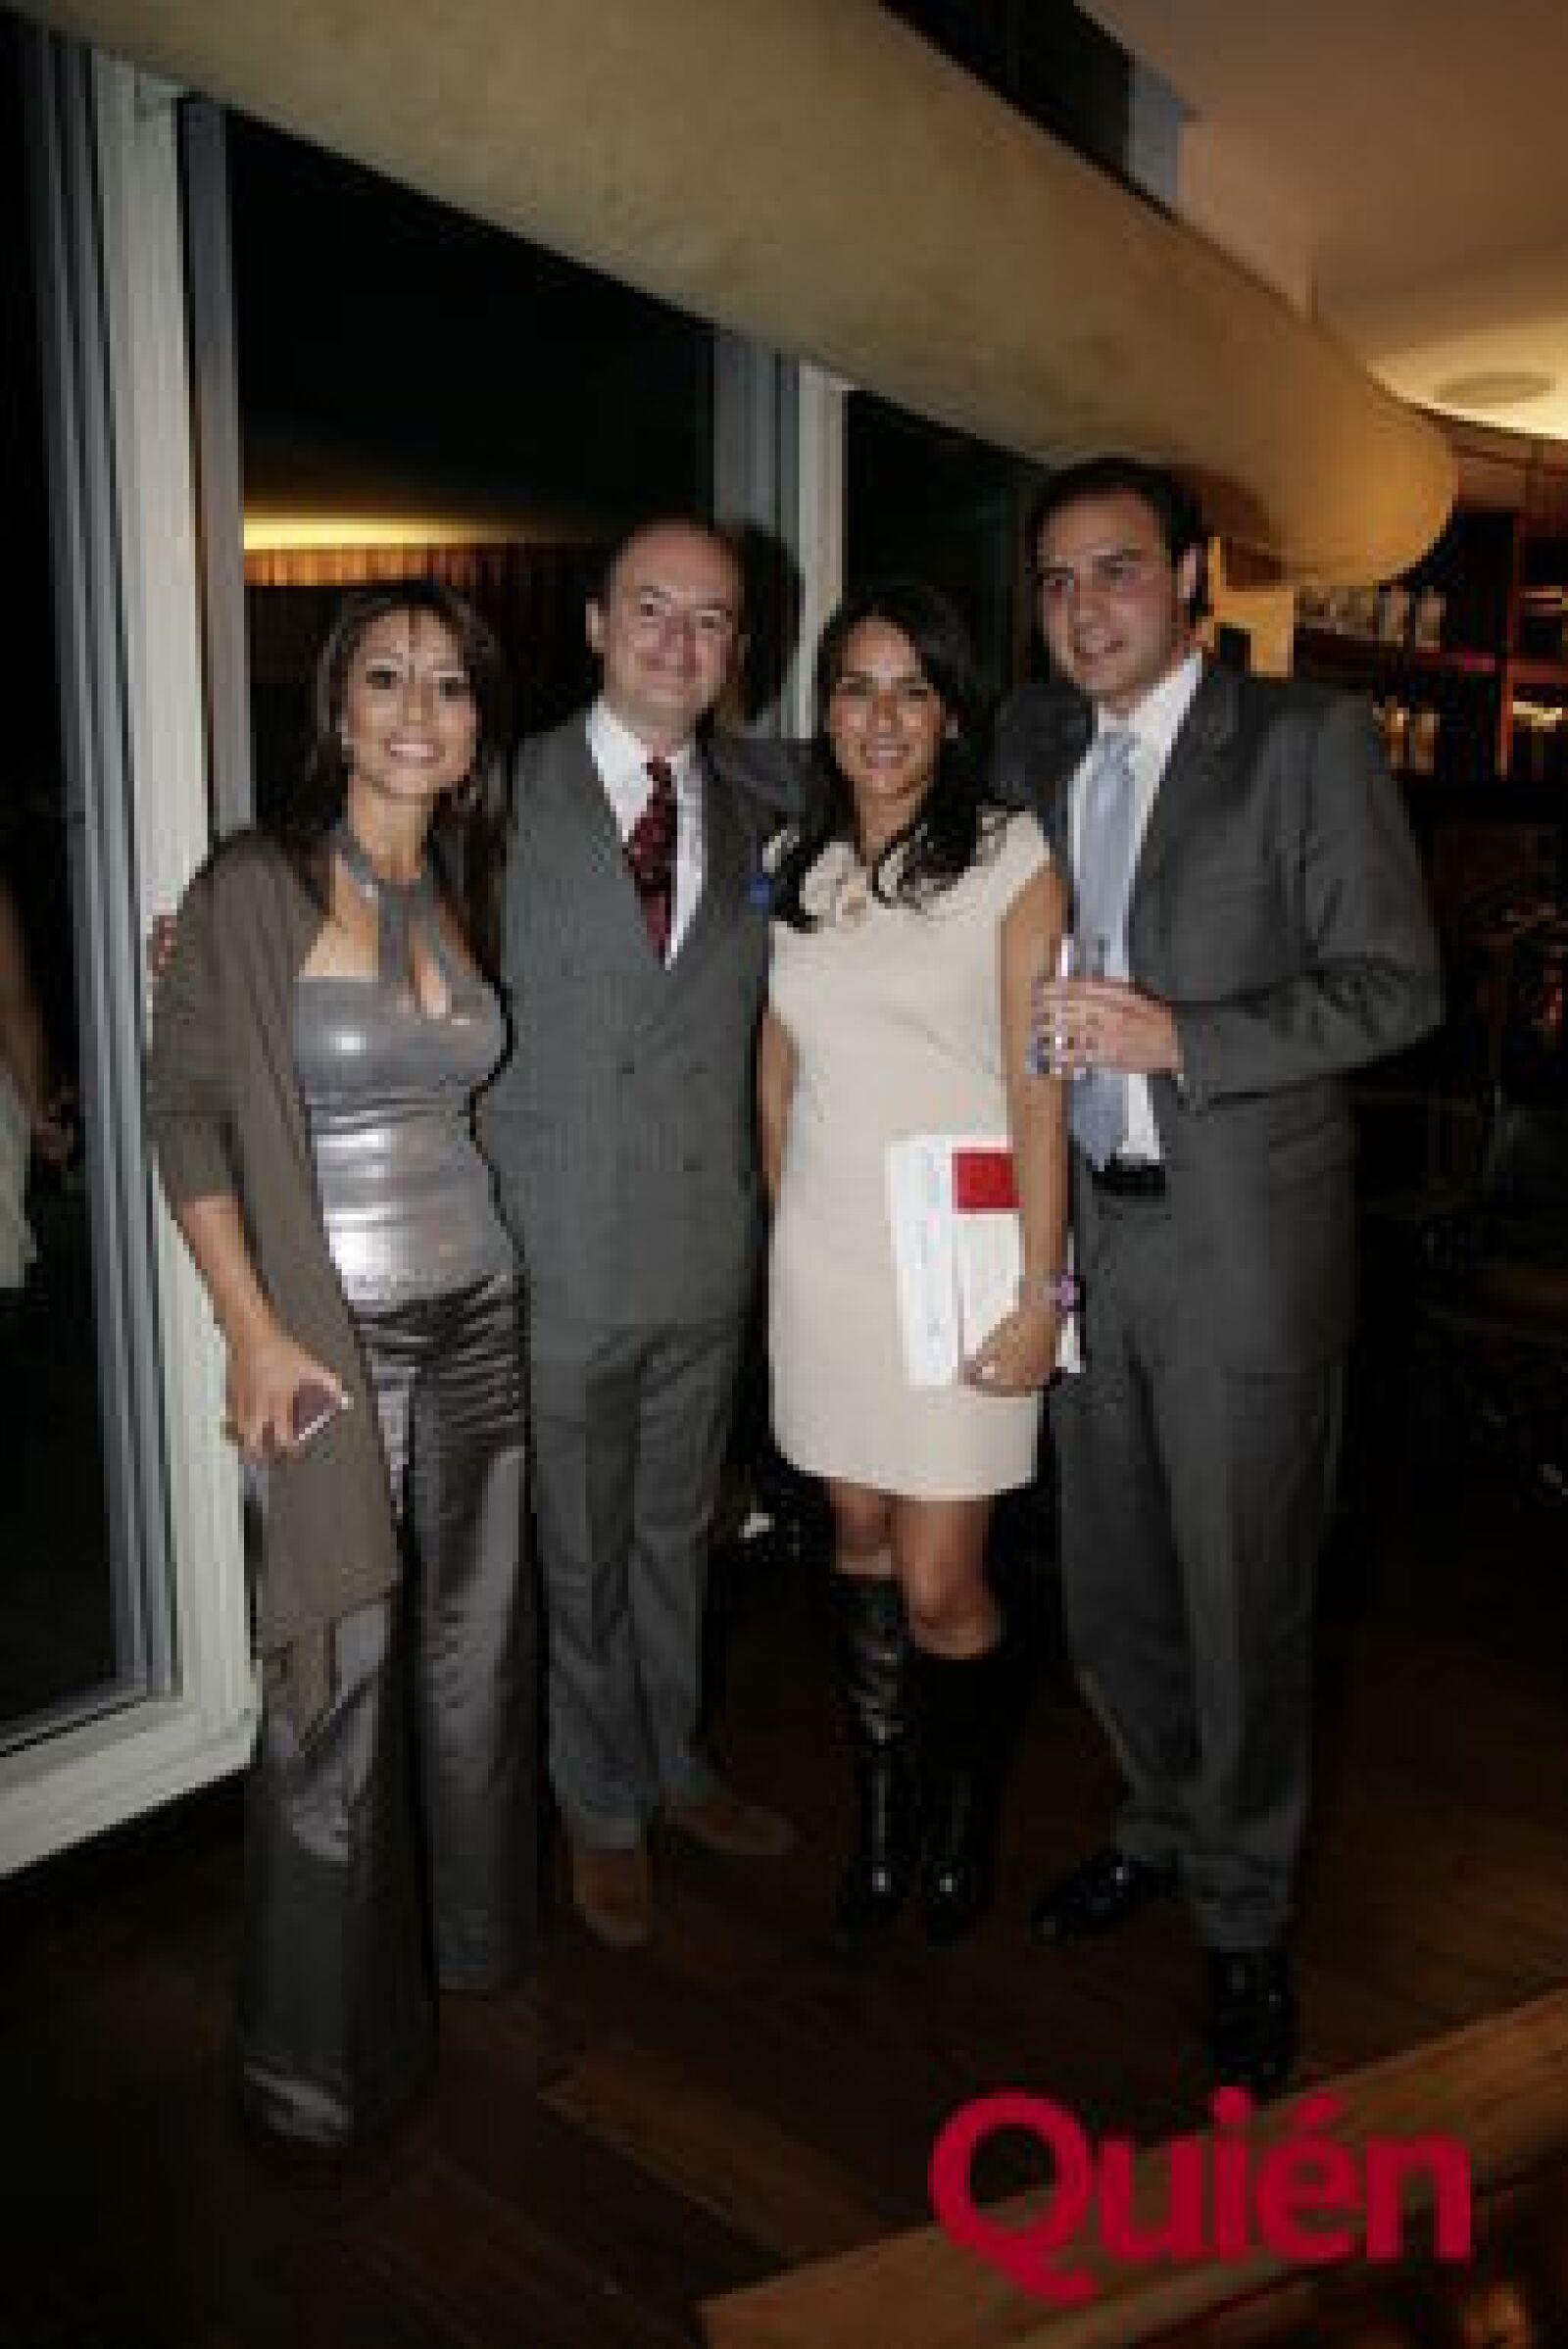 Rosario Brindis, Rodrigo López-Portillo, Ximena Iñigo, Alexandre Pochard